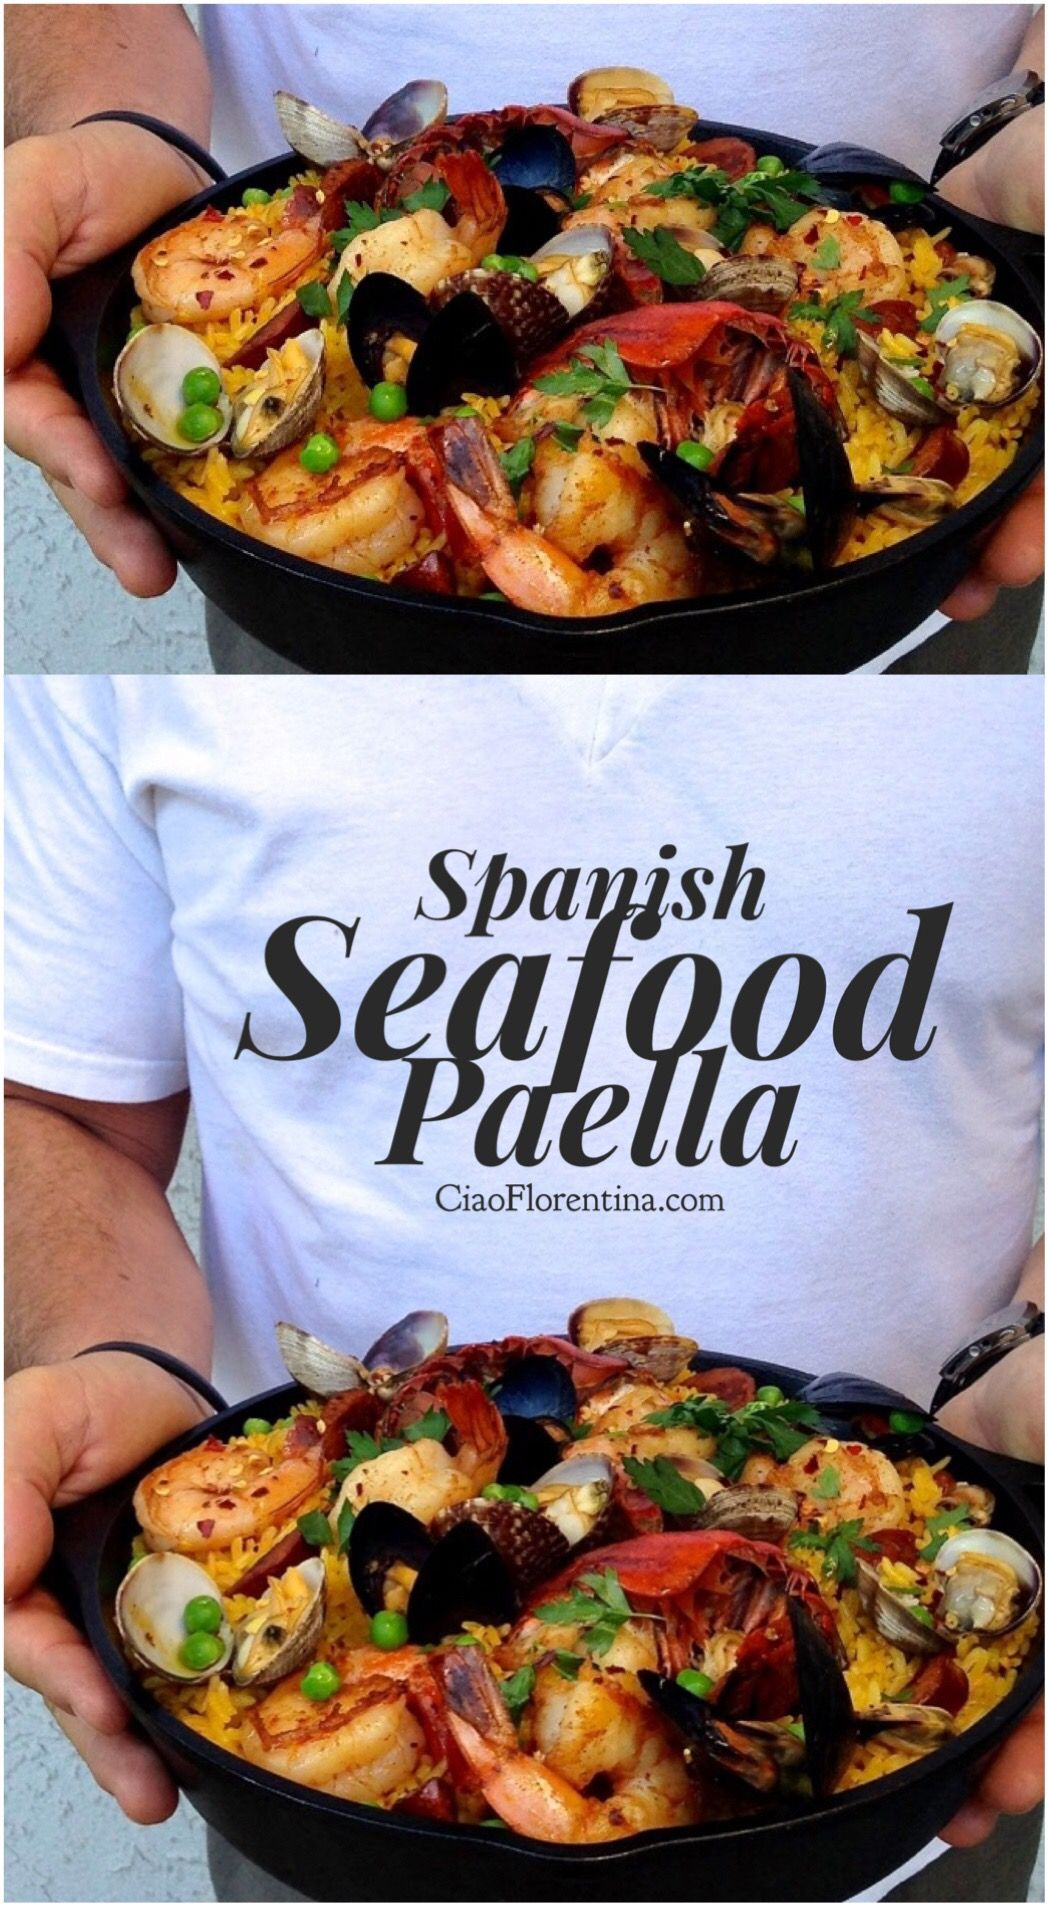 Spanish Seafood Paella (Healthy) | Recipe | Family ...